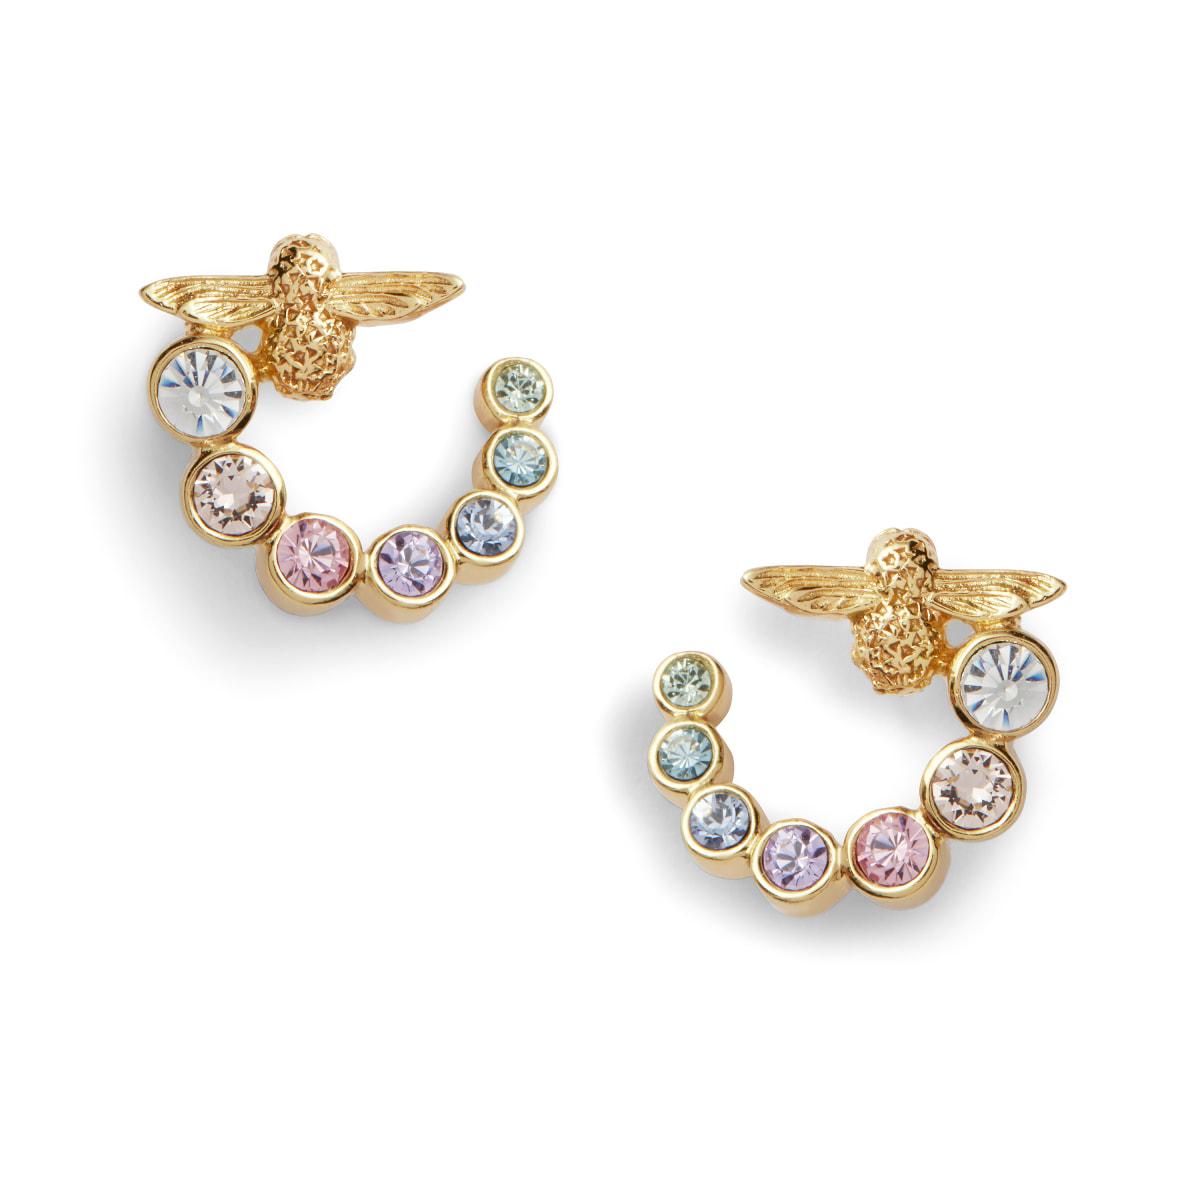 OLIVIA BURTON – OBJ16AME132 – RAINBOW BEE SWIRL HOOP EARRINGS GOLD – £50.00